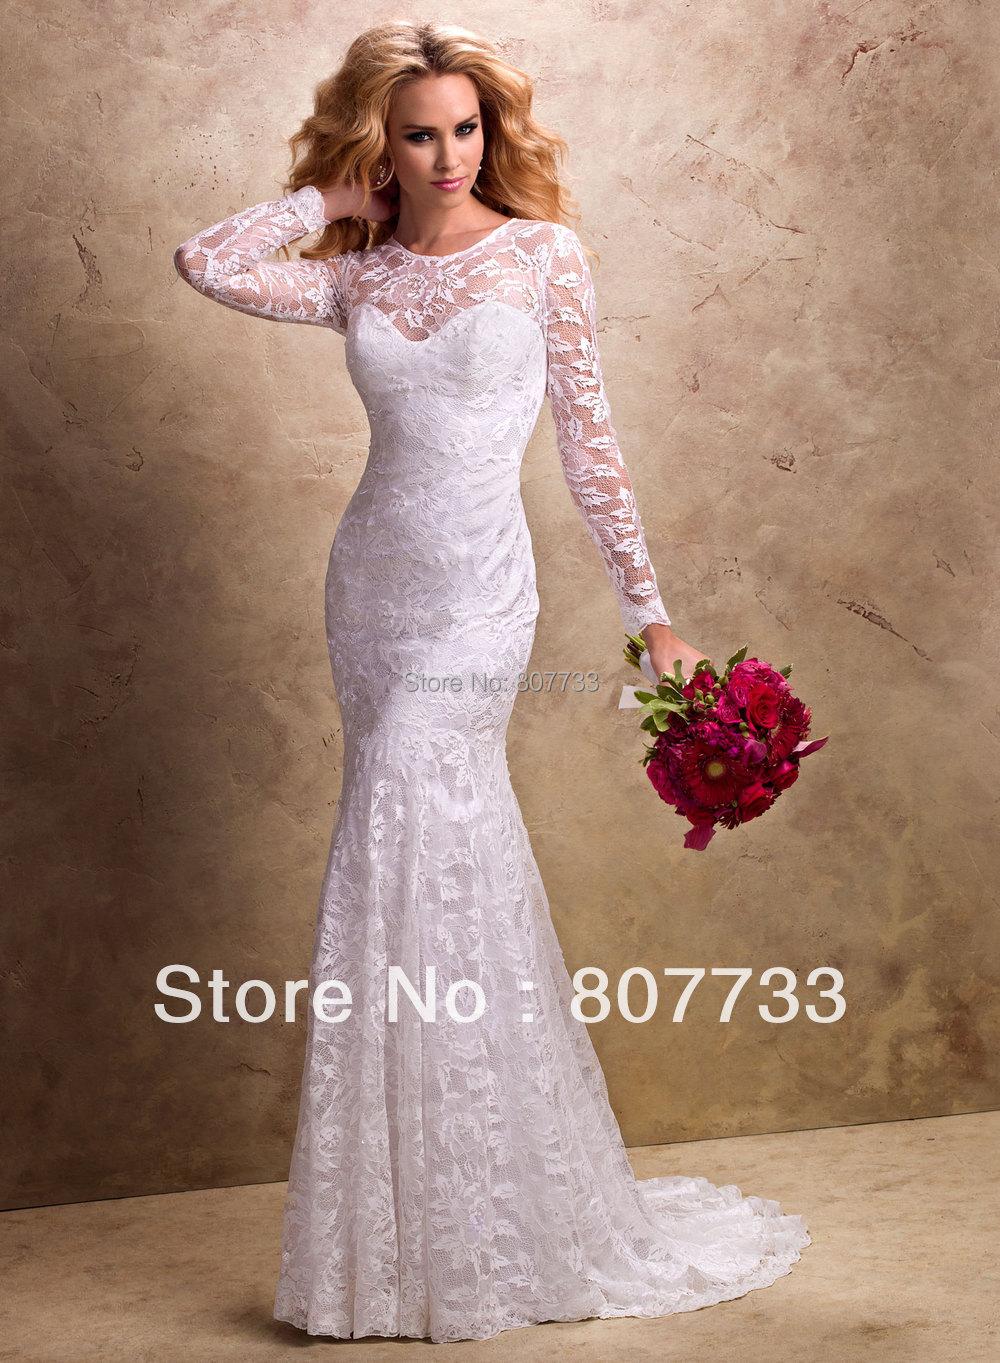 TT85 long sleeve sexy Mermaid wedding dress 2014-in Wedding ...